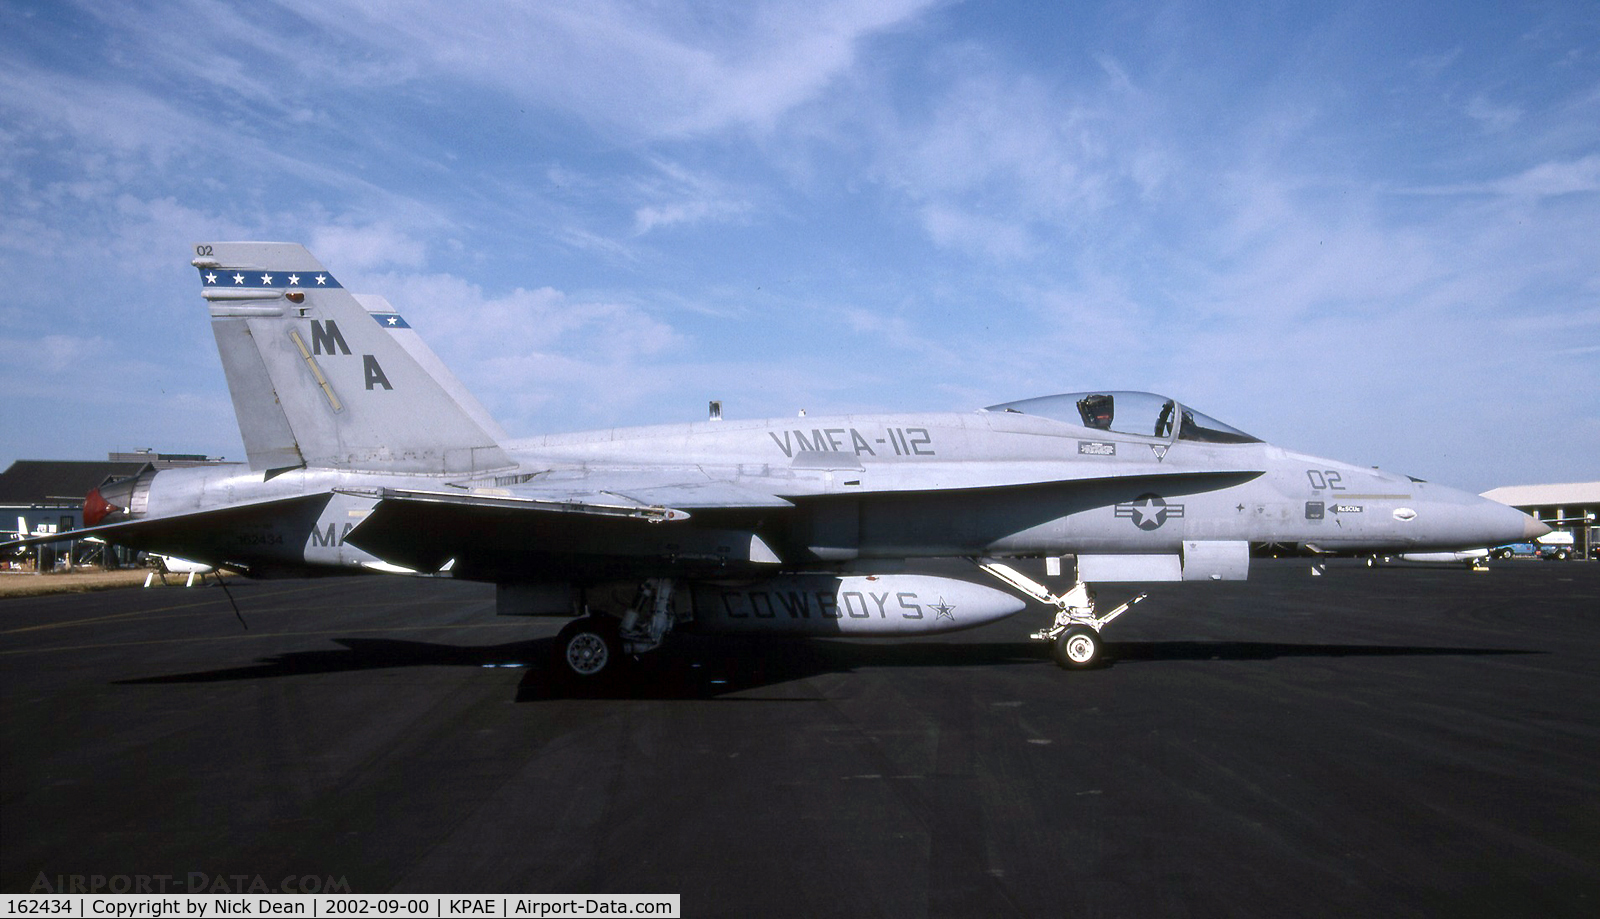 162434, McDonnell Douglas F/A-18A+ Hornet C/N 0277, KPAE W/O 21st Apr 2004